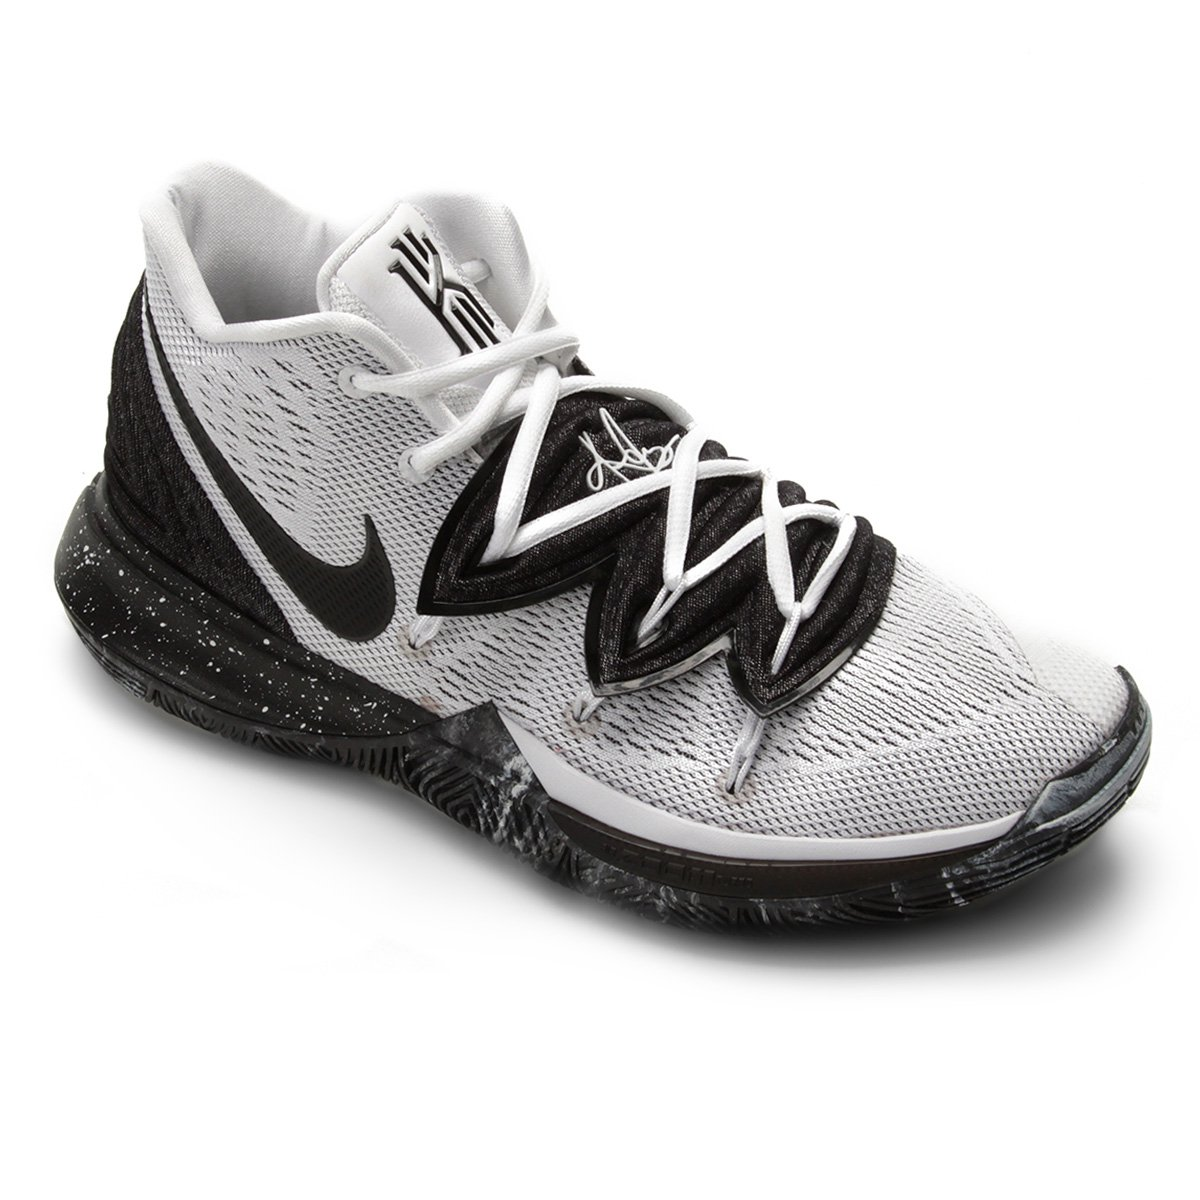 c0eacd4c64 Tênis Nike Kyrie 5 Masculino   Netshoes